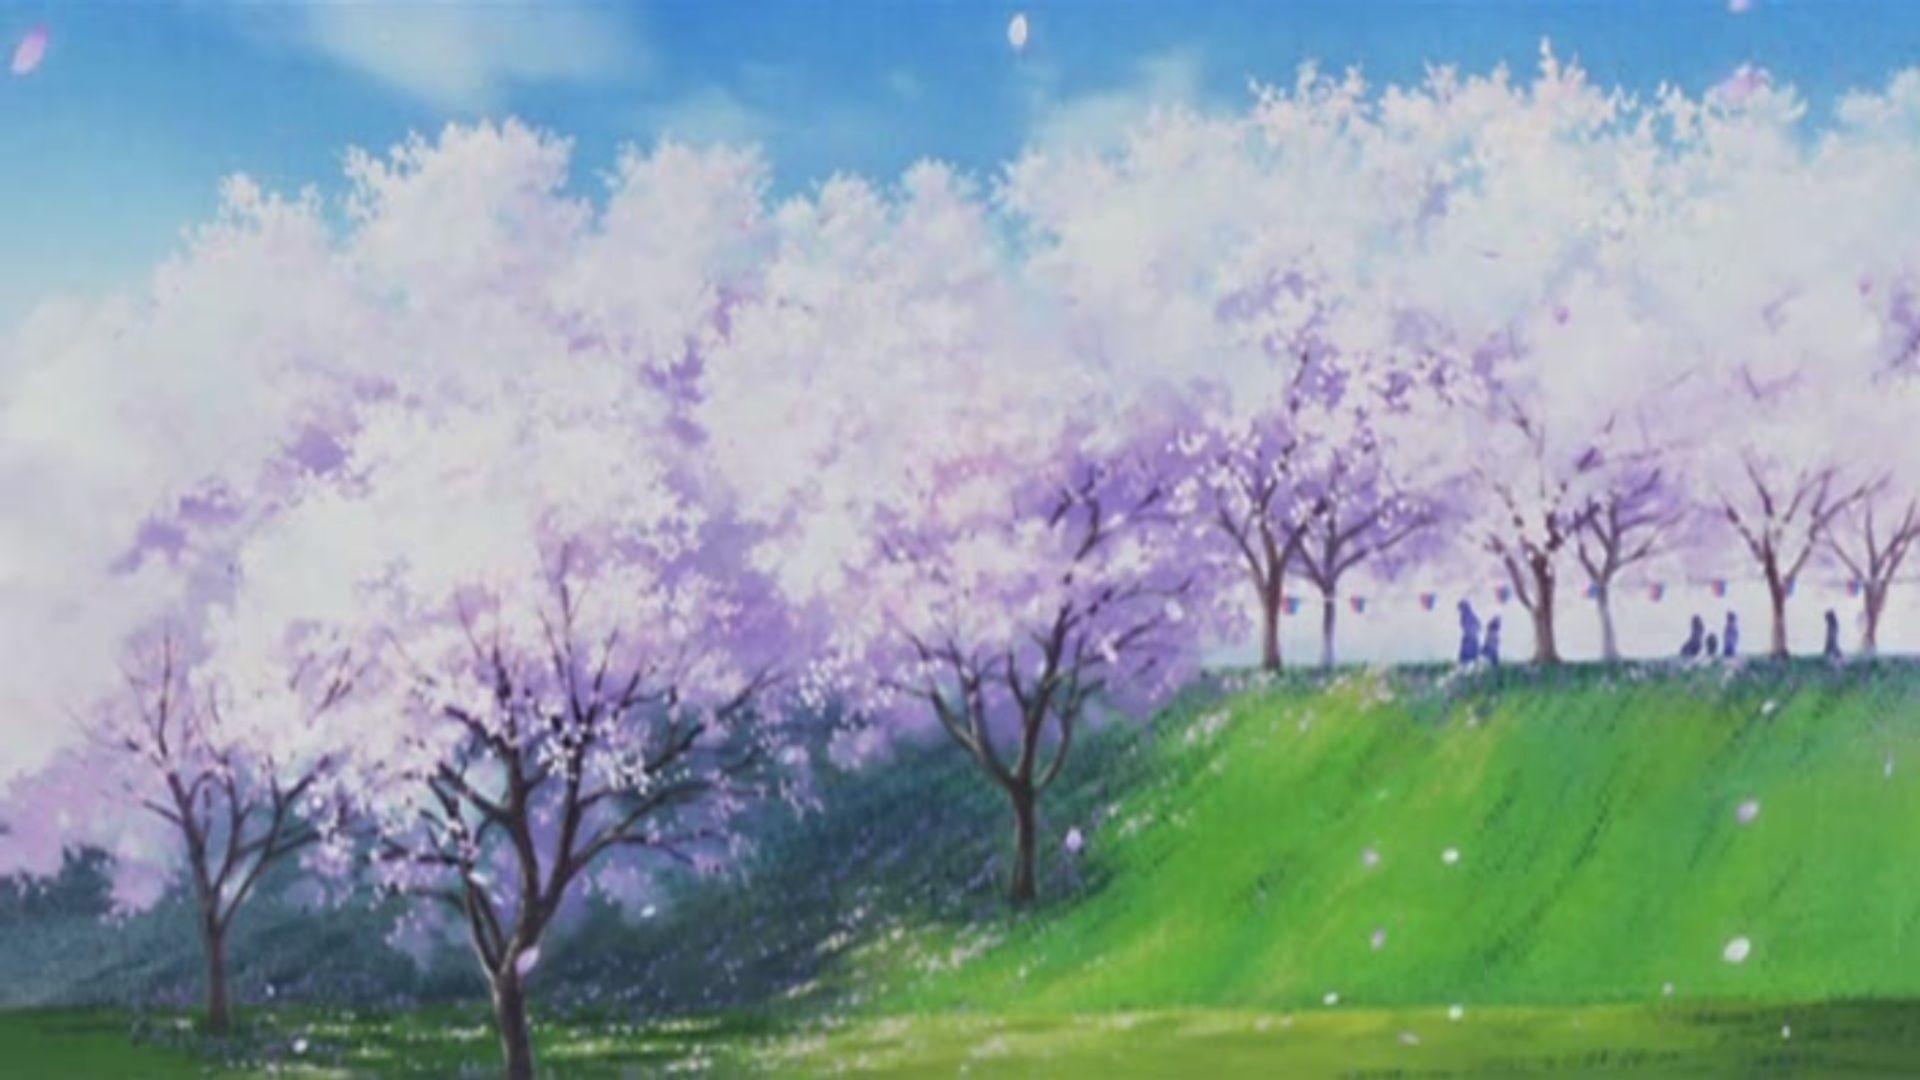 Res: 1920x1080, x Anime Scenery Boy Under Tree Anime Scenery Wallpapers